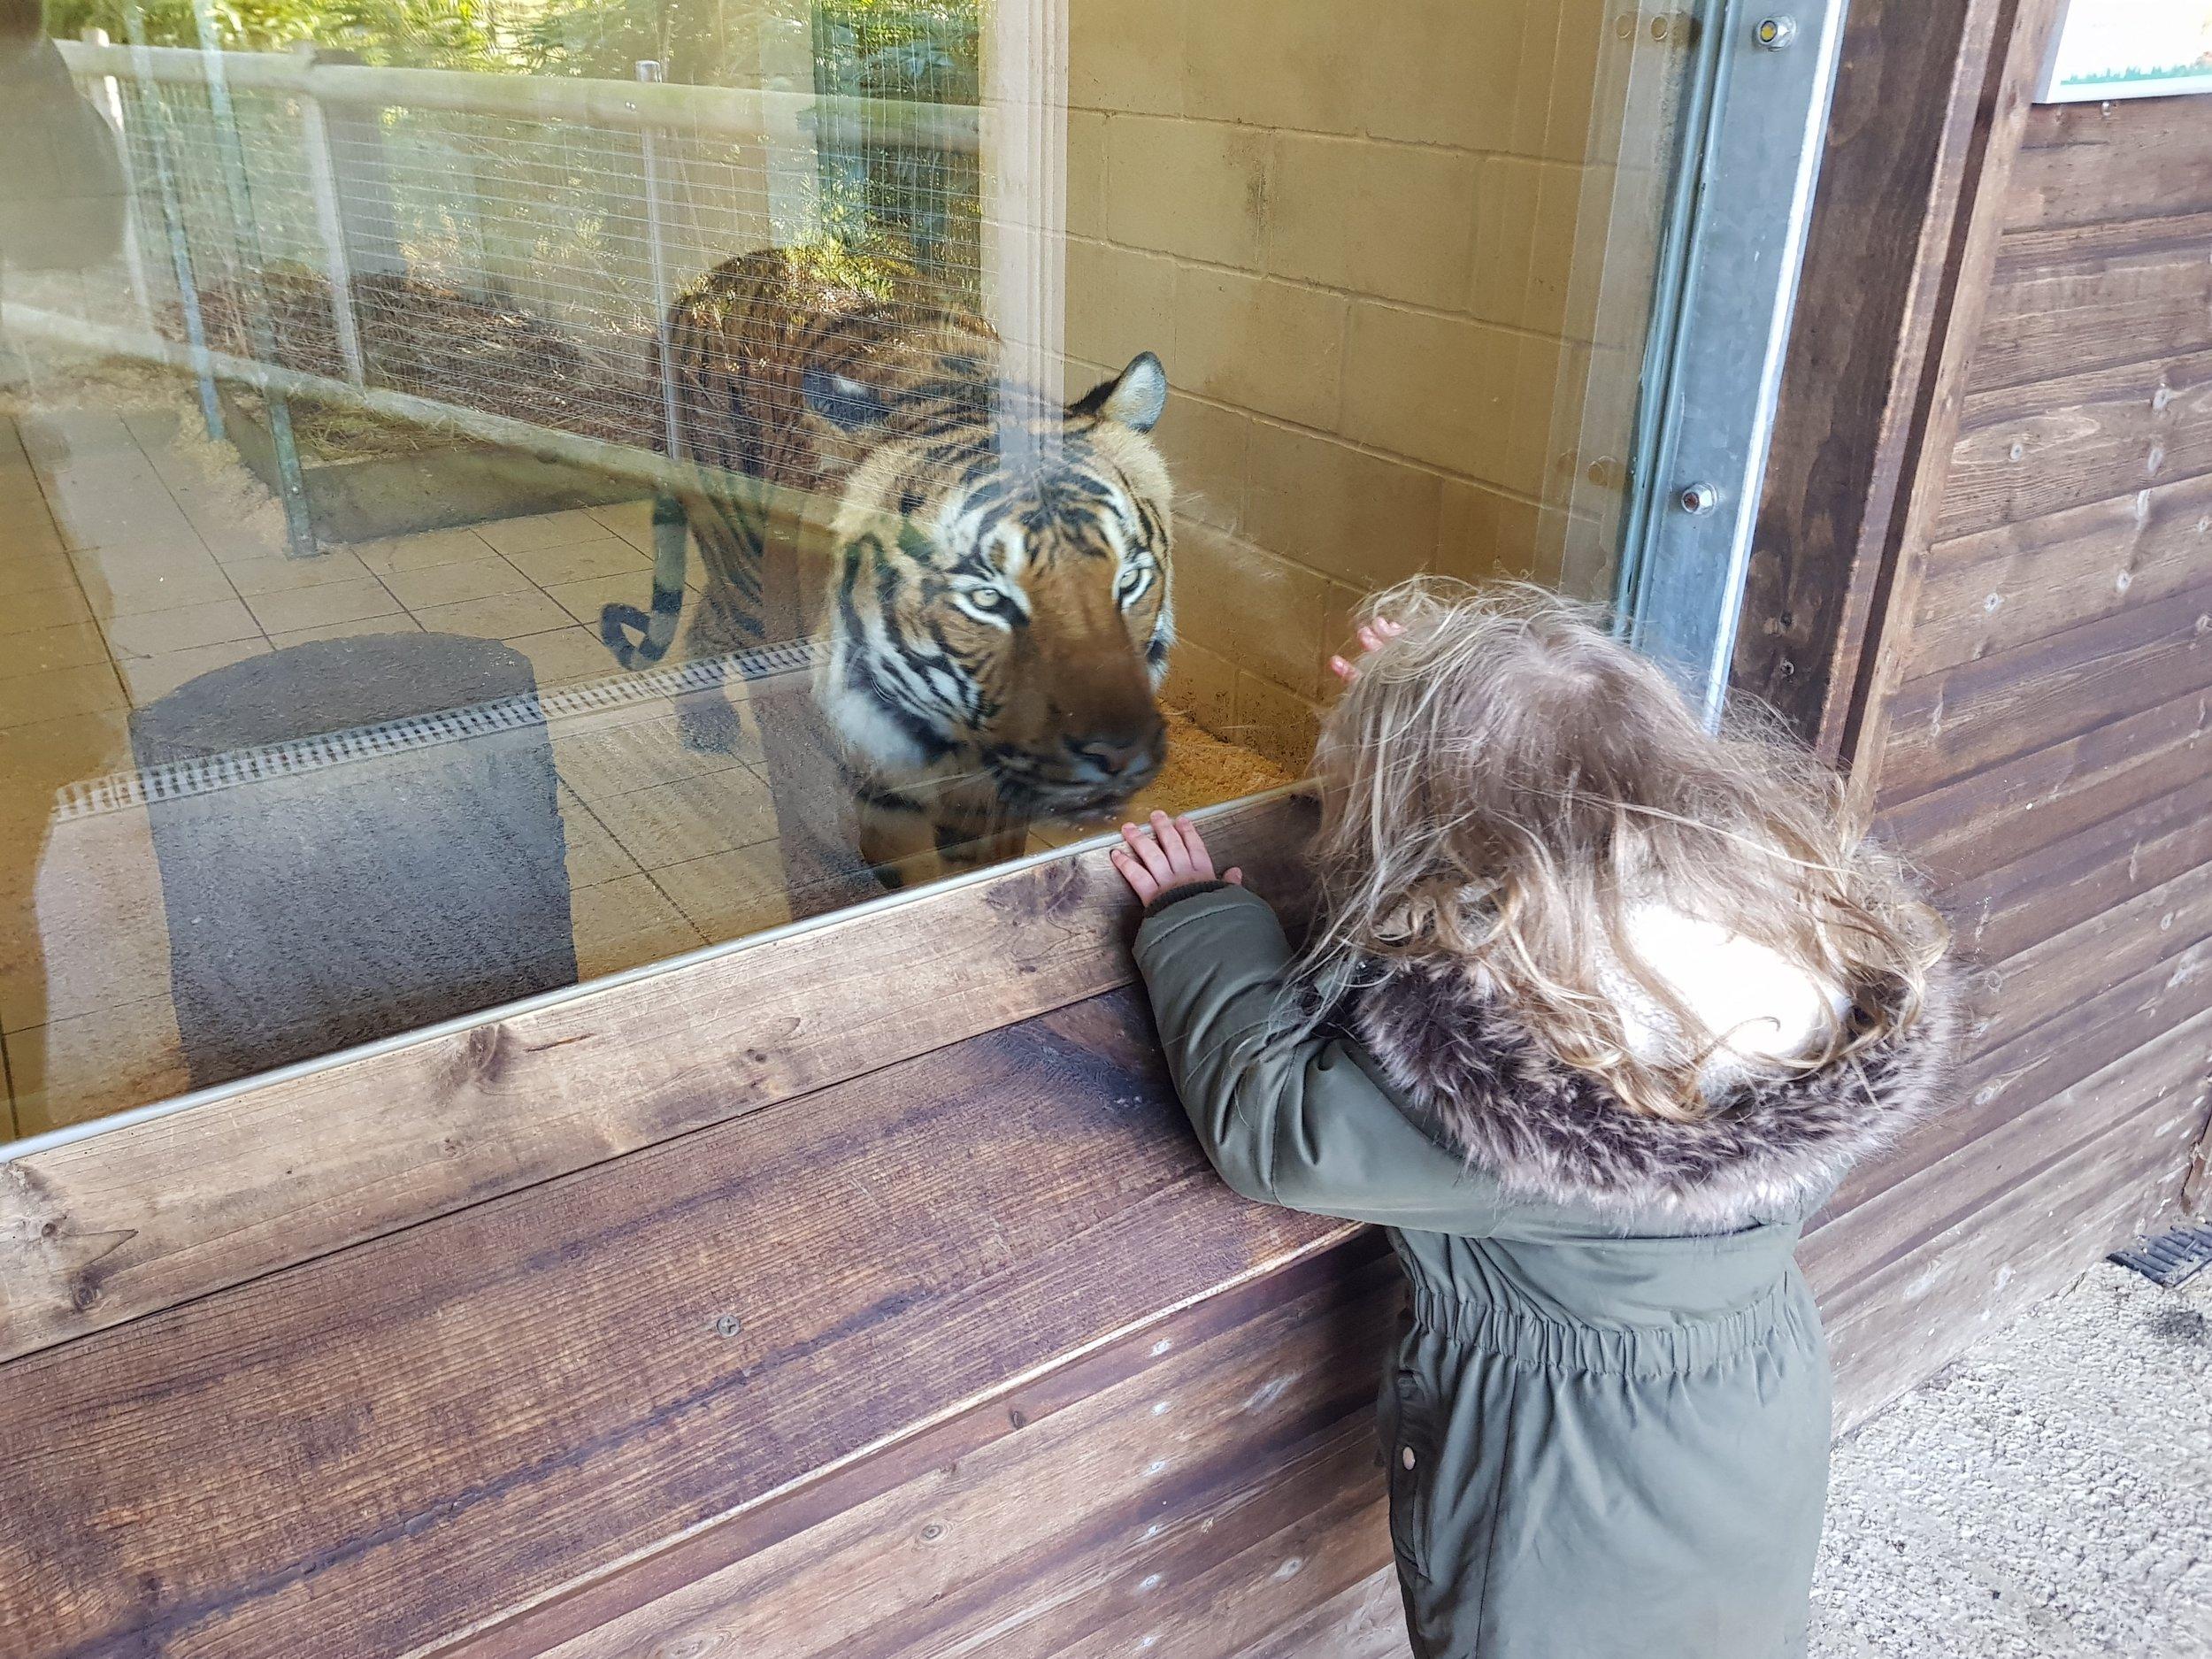 Hamerton Zoo park's Malayan tiger